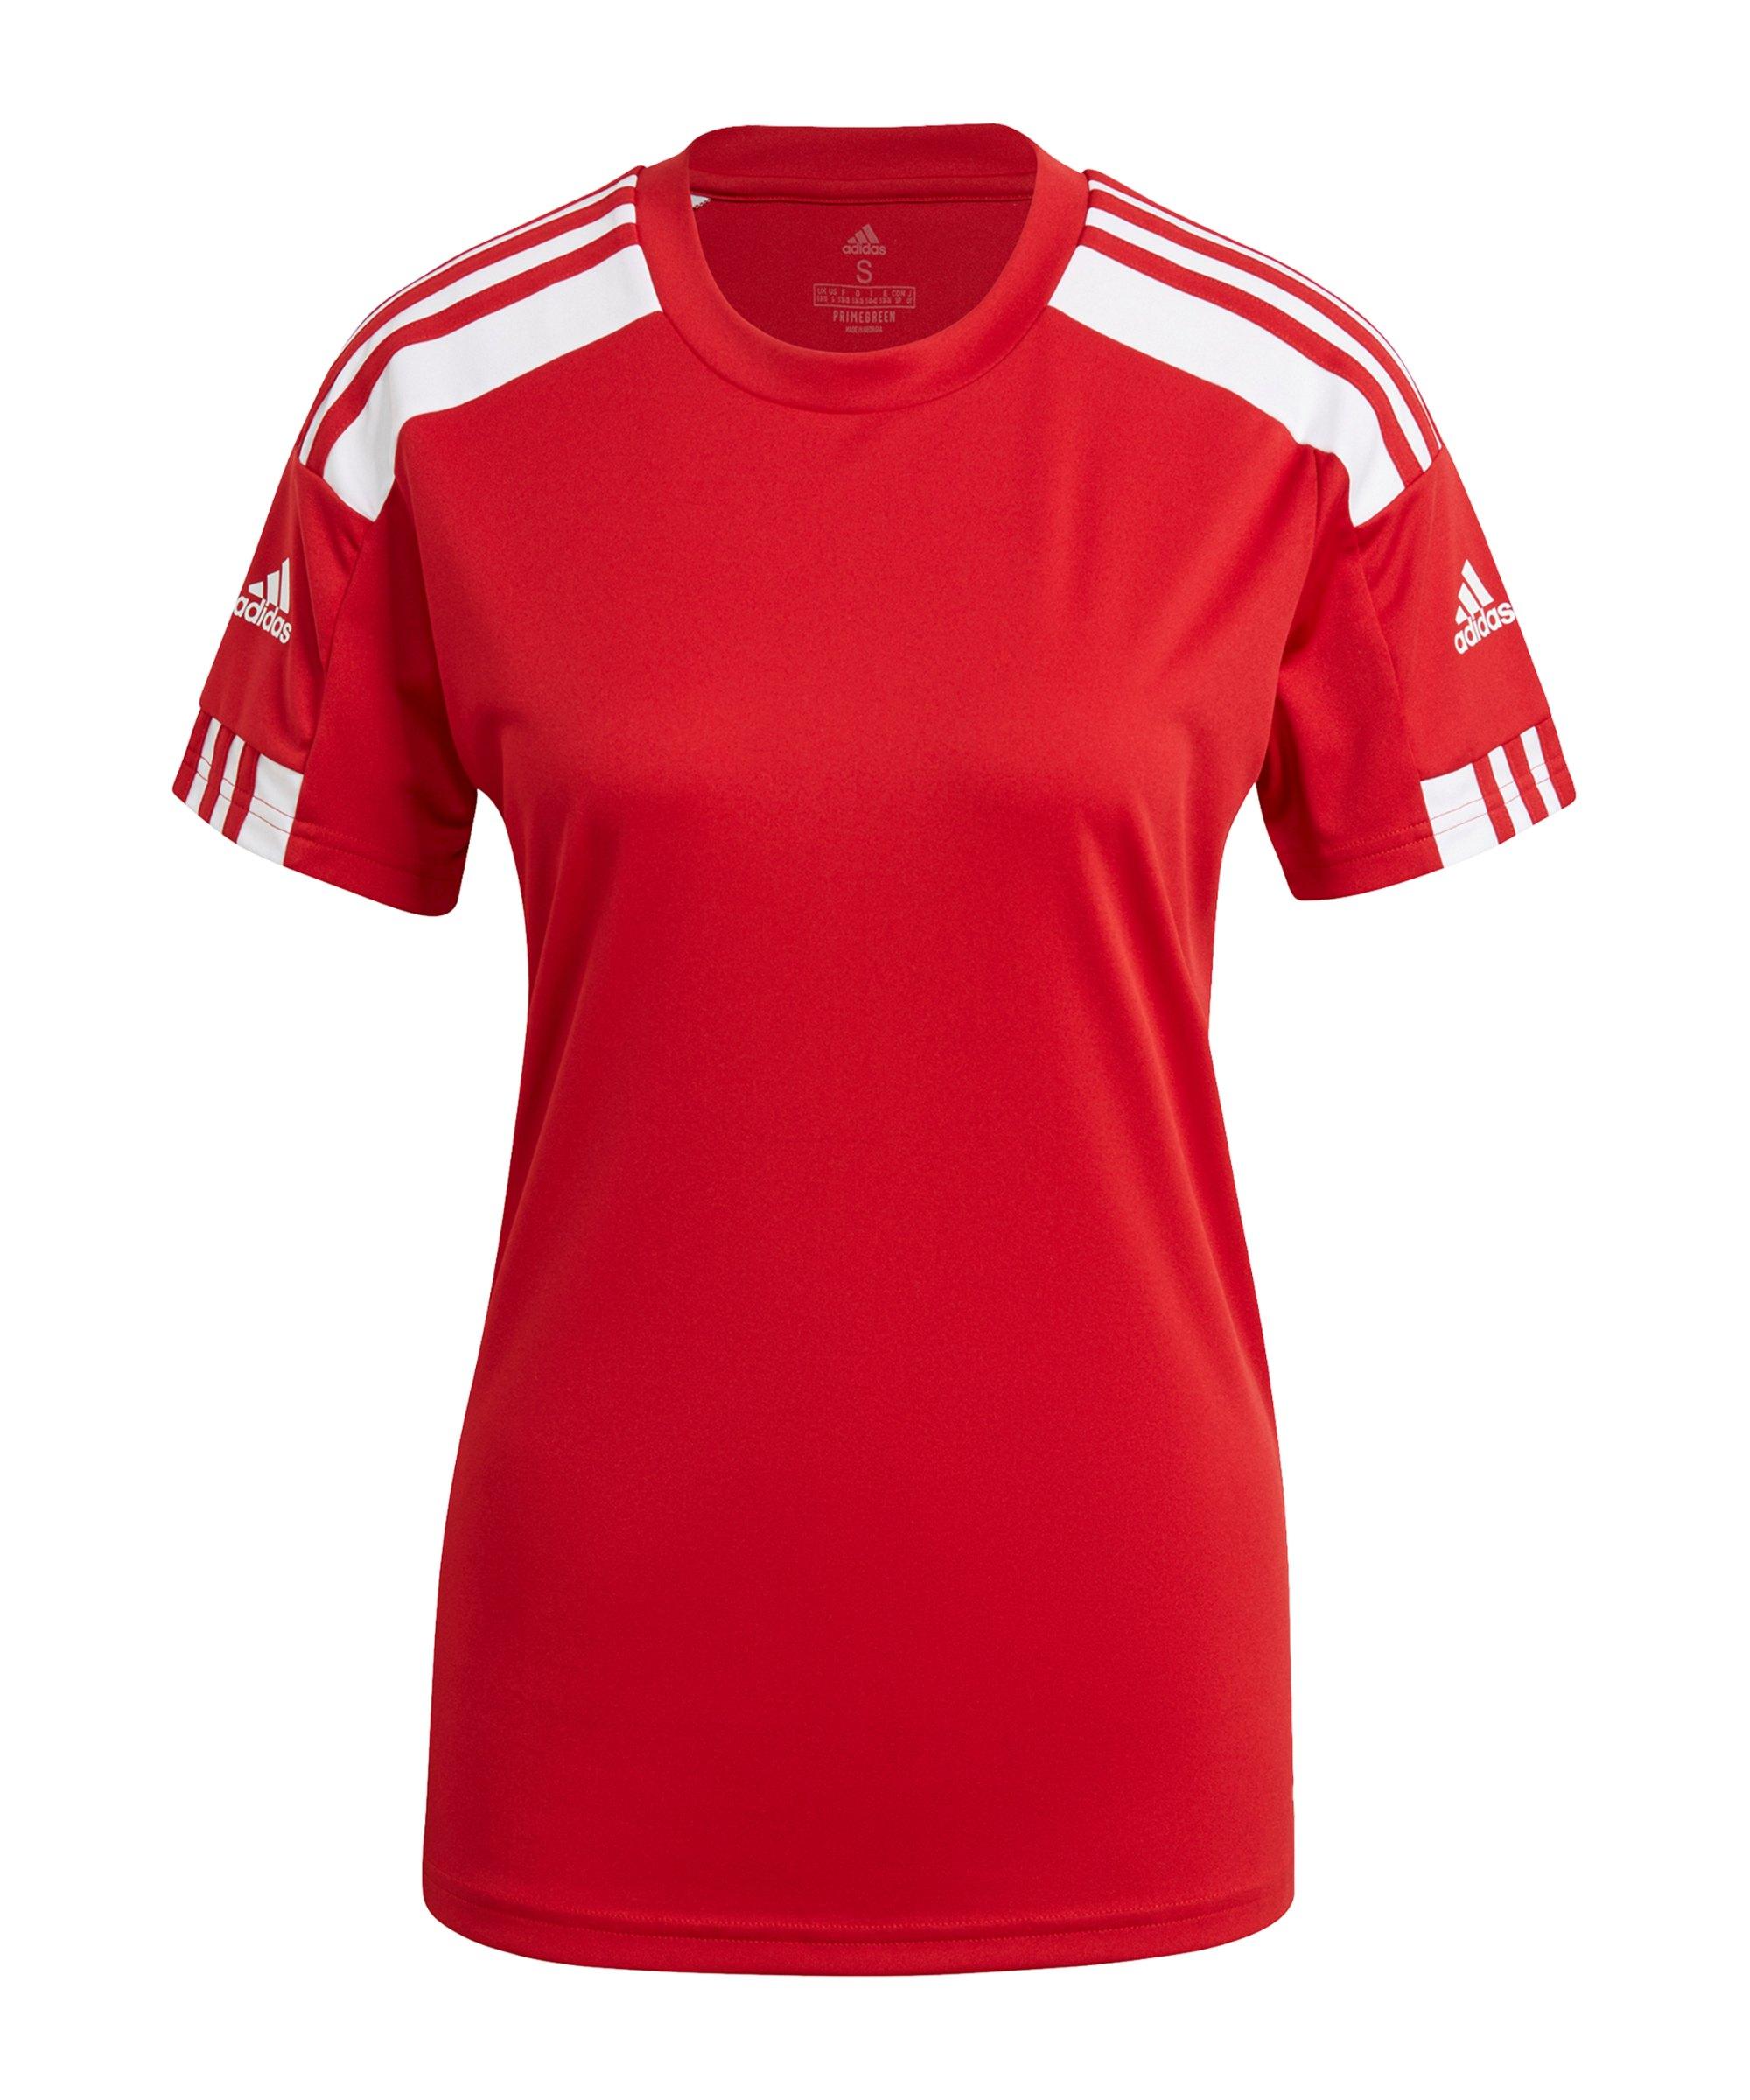 adidas Squadra 21 Trikot Damen Rot Weiss - rot